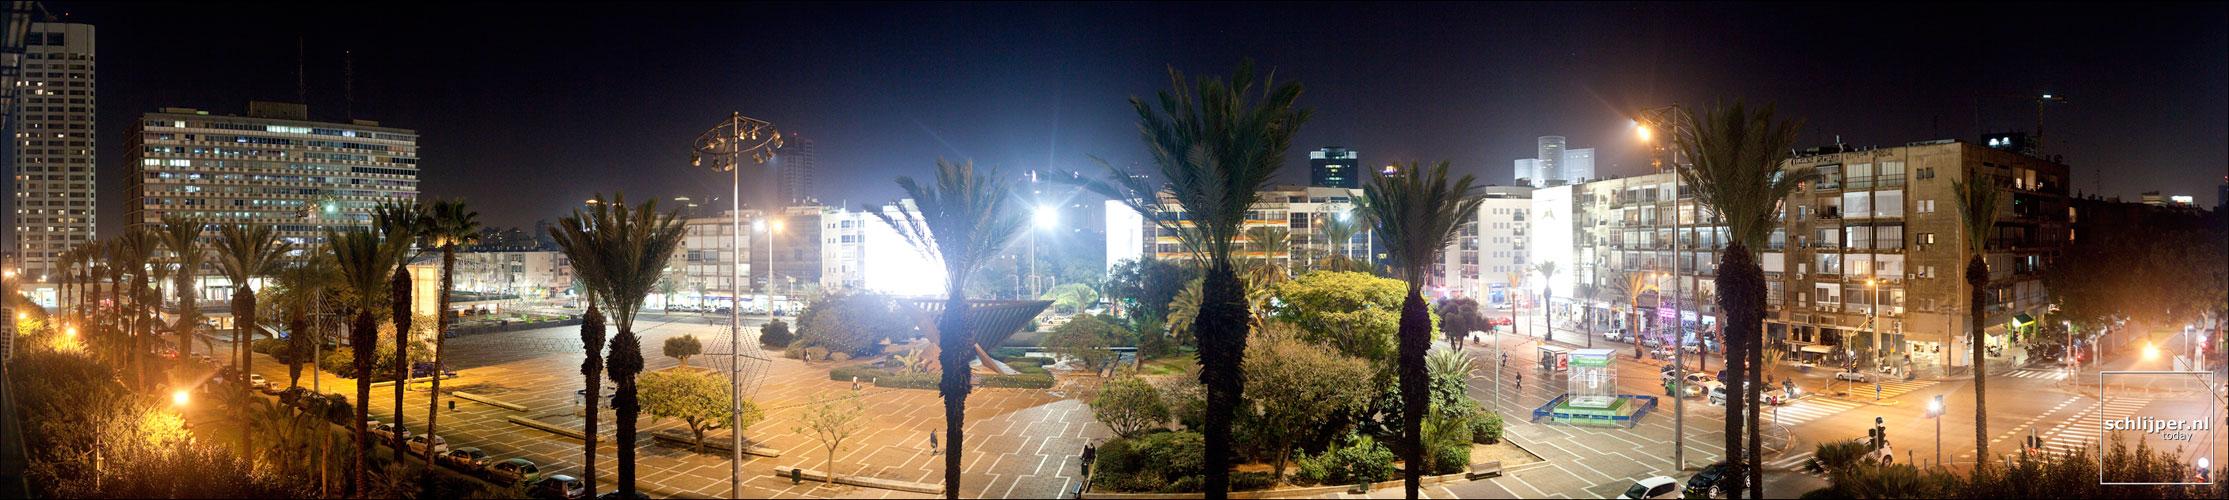 Israel, Tel Aviv, 5 november 2009